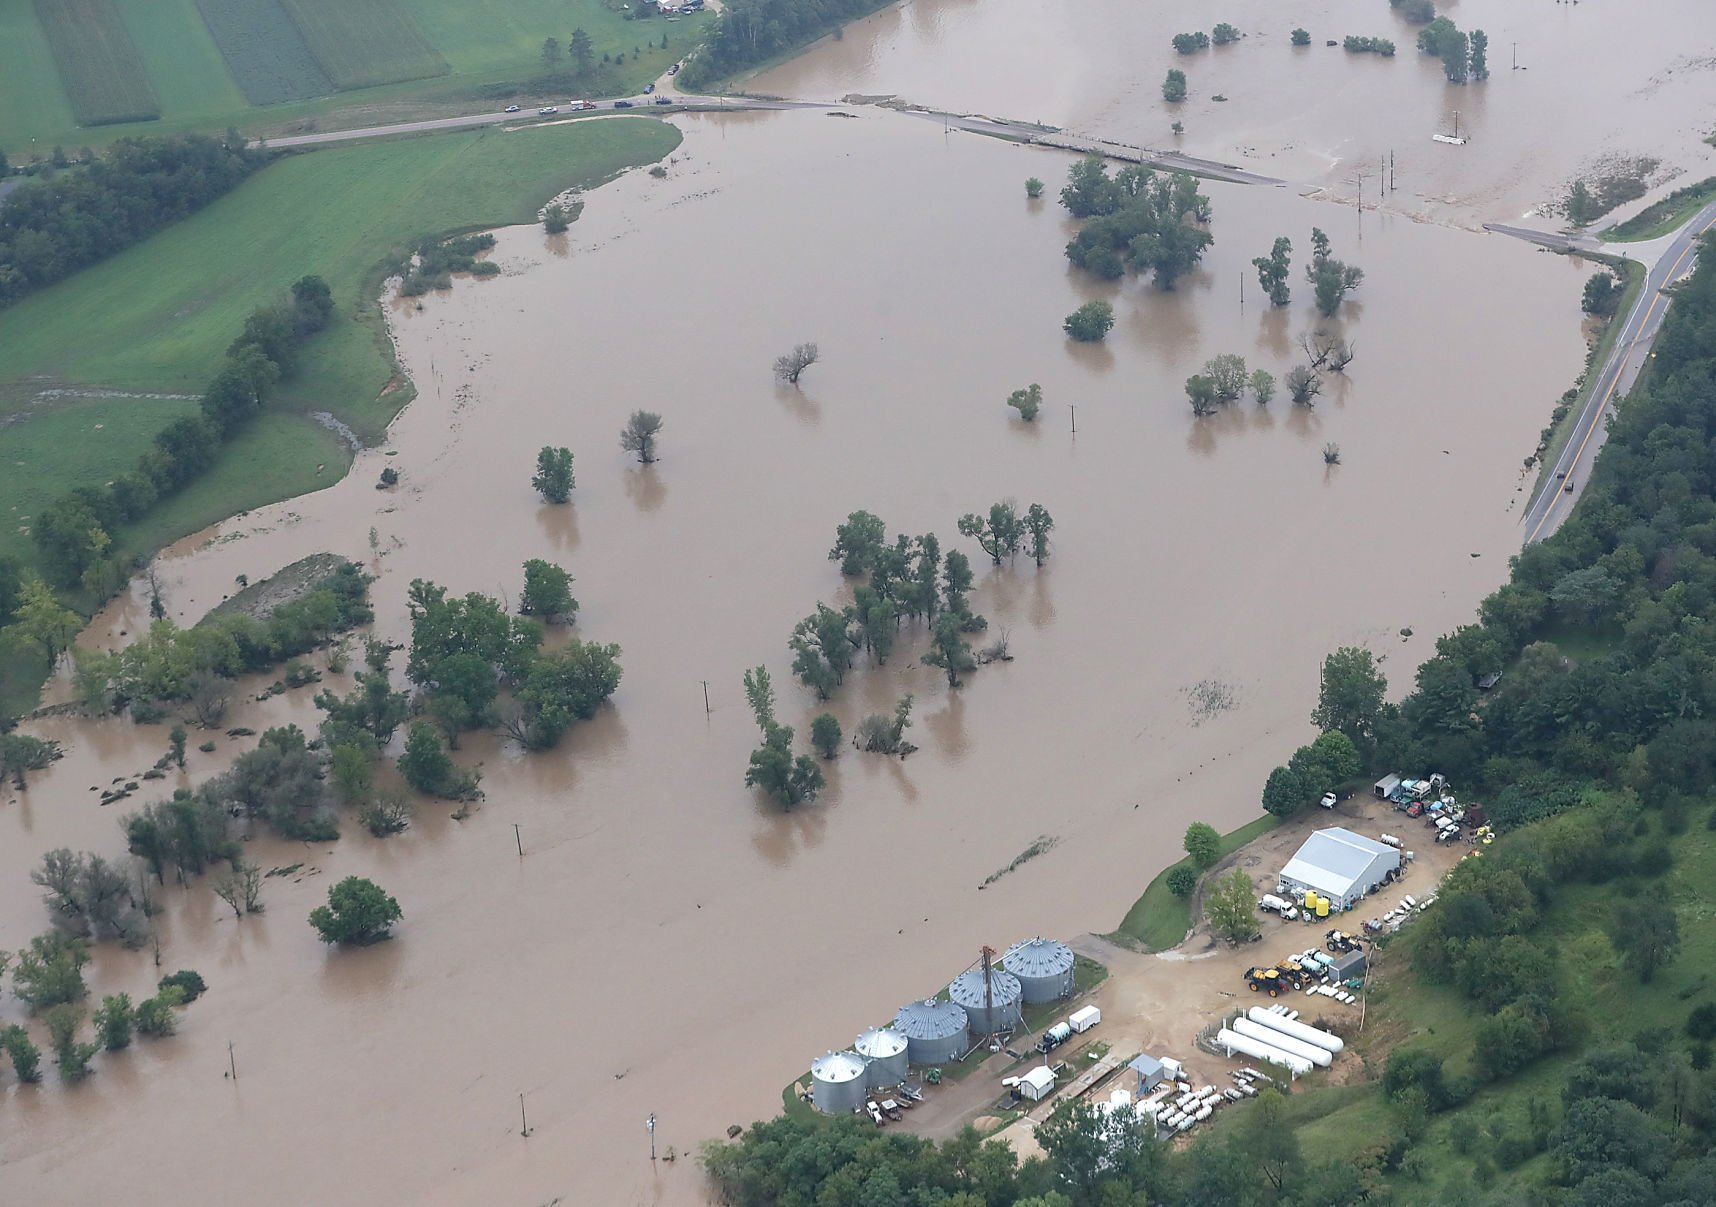 from tribune files photos show damage caused by august flooding rh lacrossetribune com